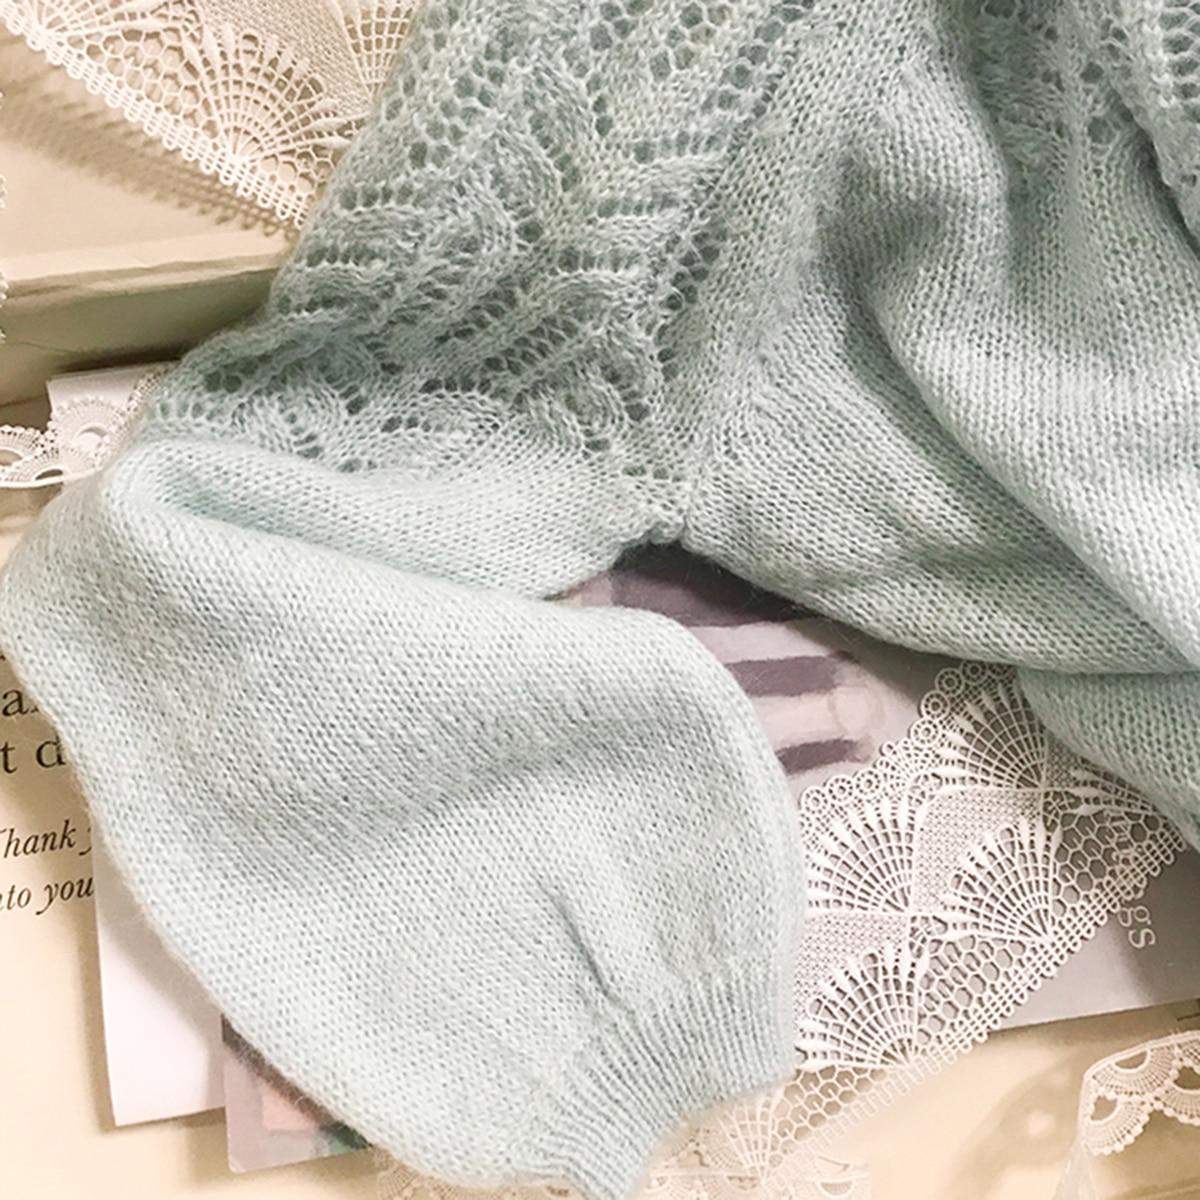 Chic Mohair Knitwear Gilet 2021 Woman Long Sleeve Round Neck Elegant Cardigan Ladies Autumn Winter Casual Vintage Sweater Jumper enlarge